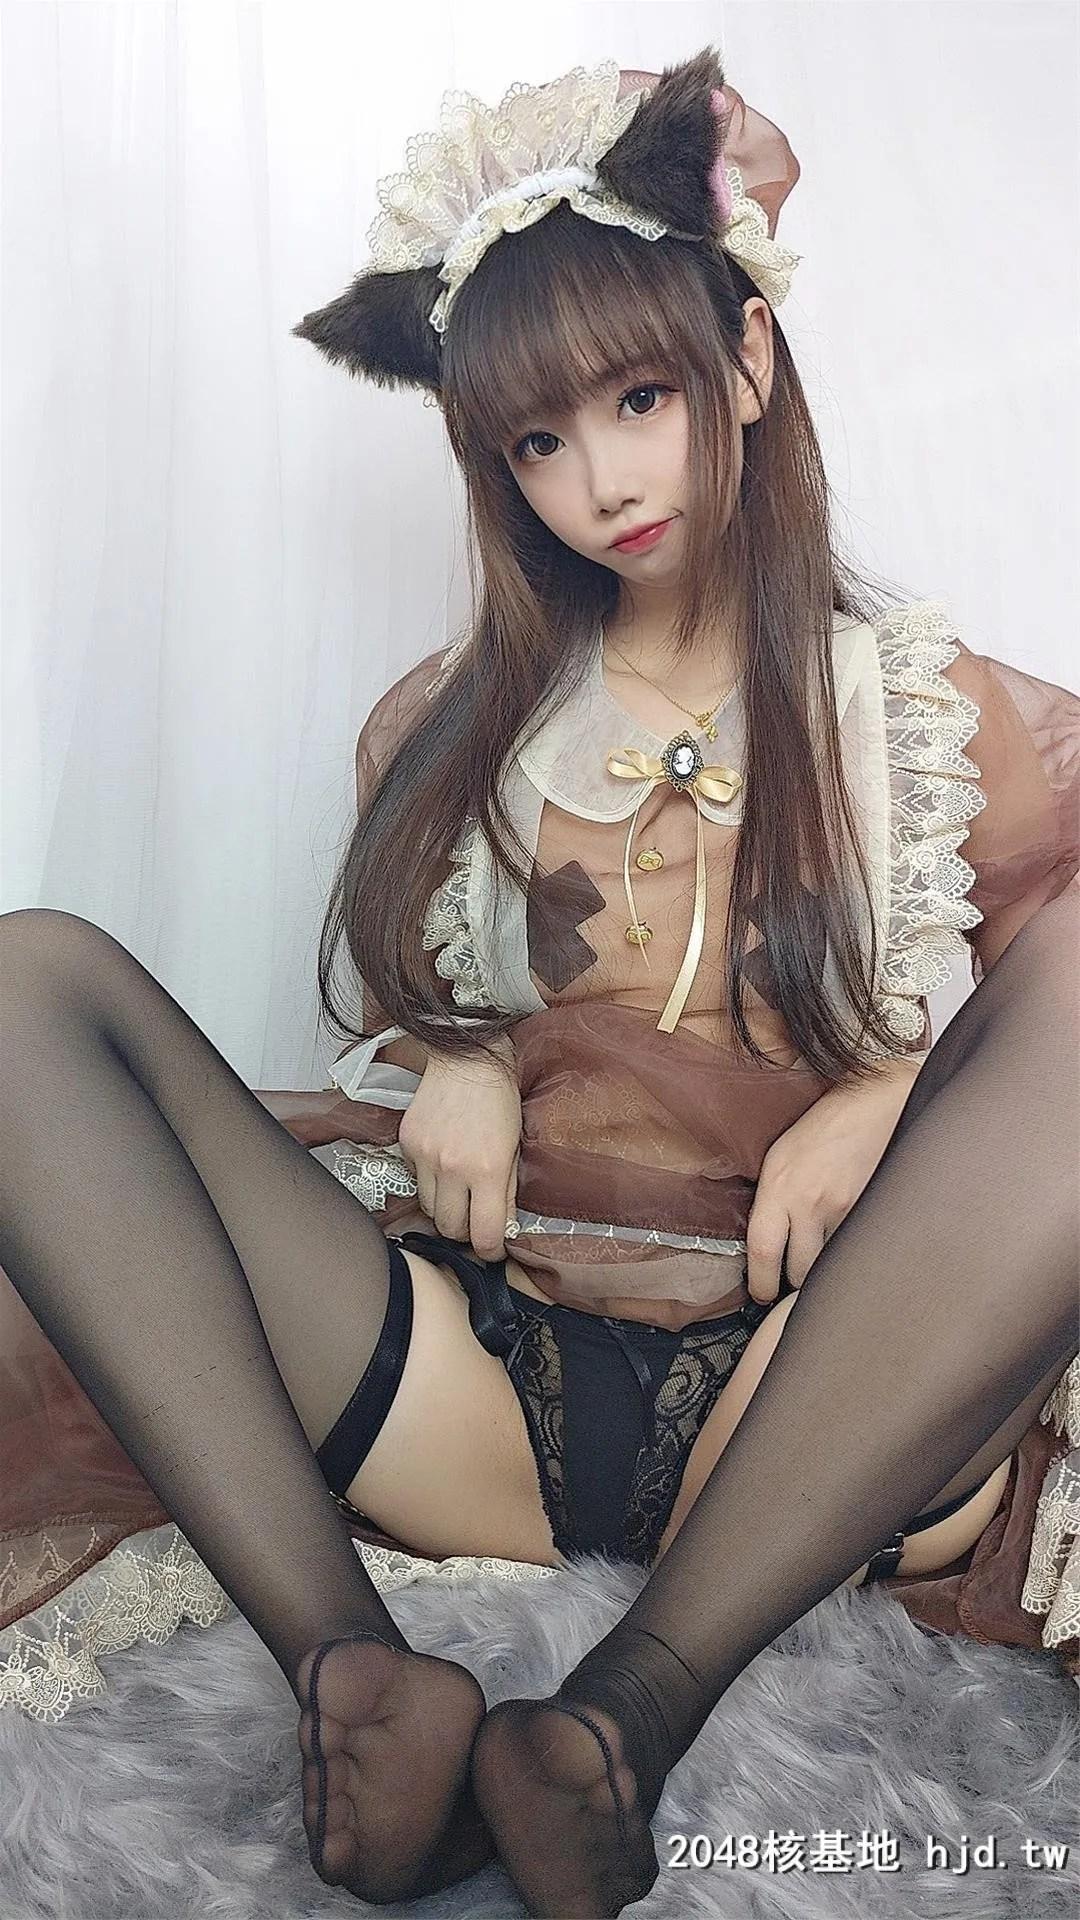 【Cos小姐姐雪琪】 透明女仆 [43P]插图